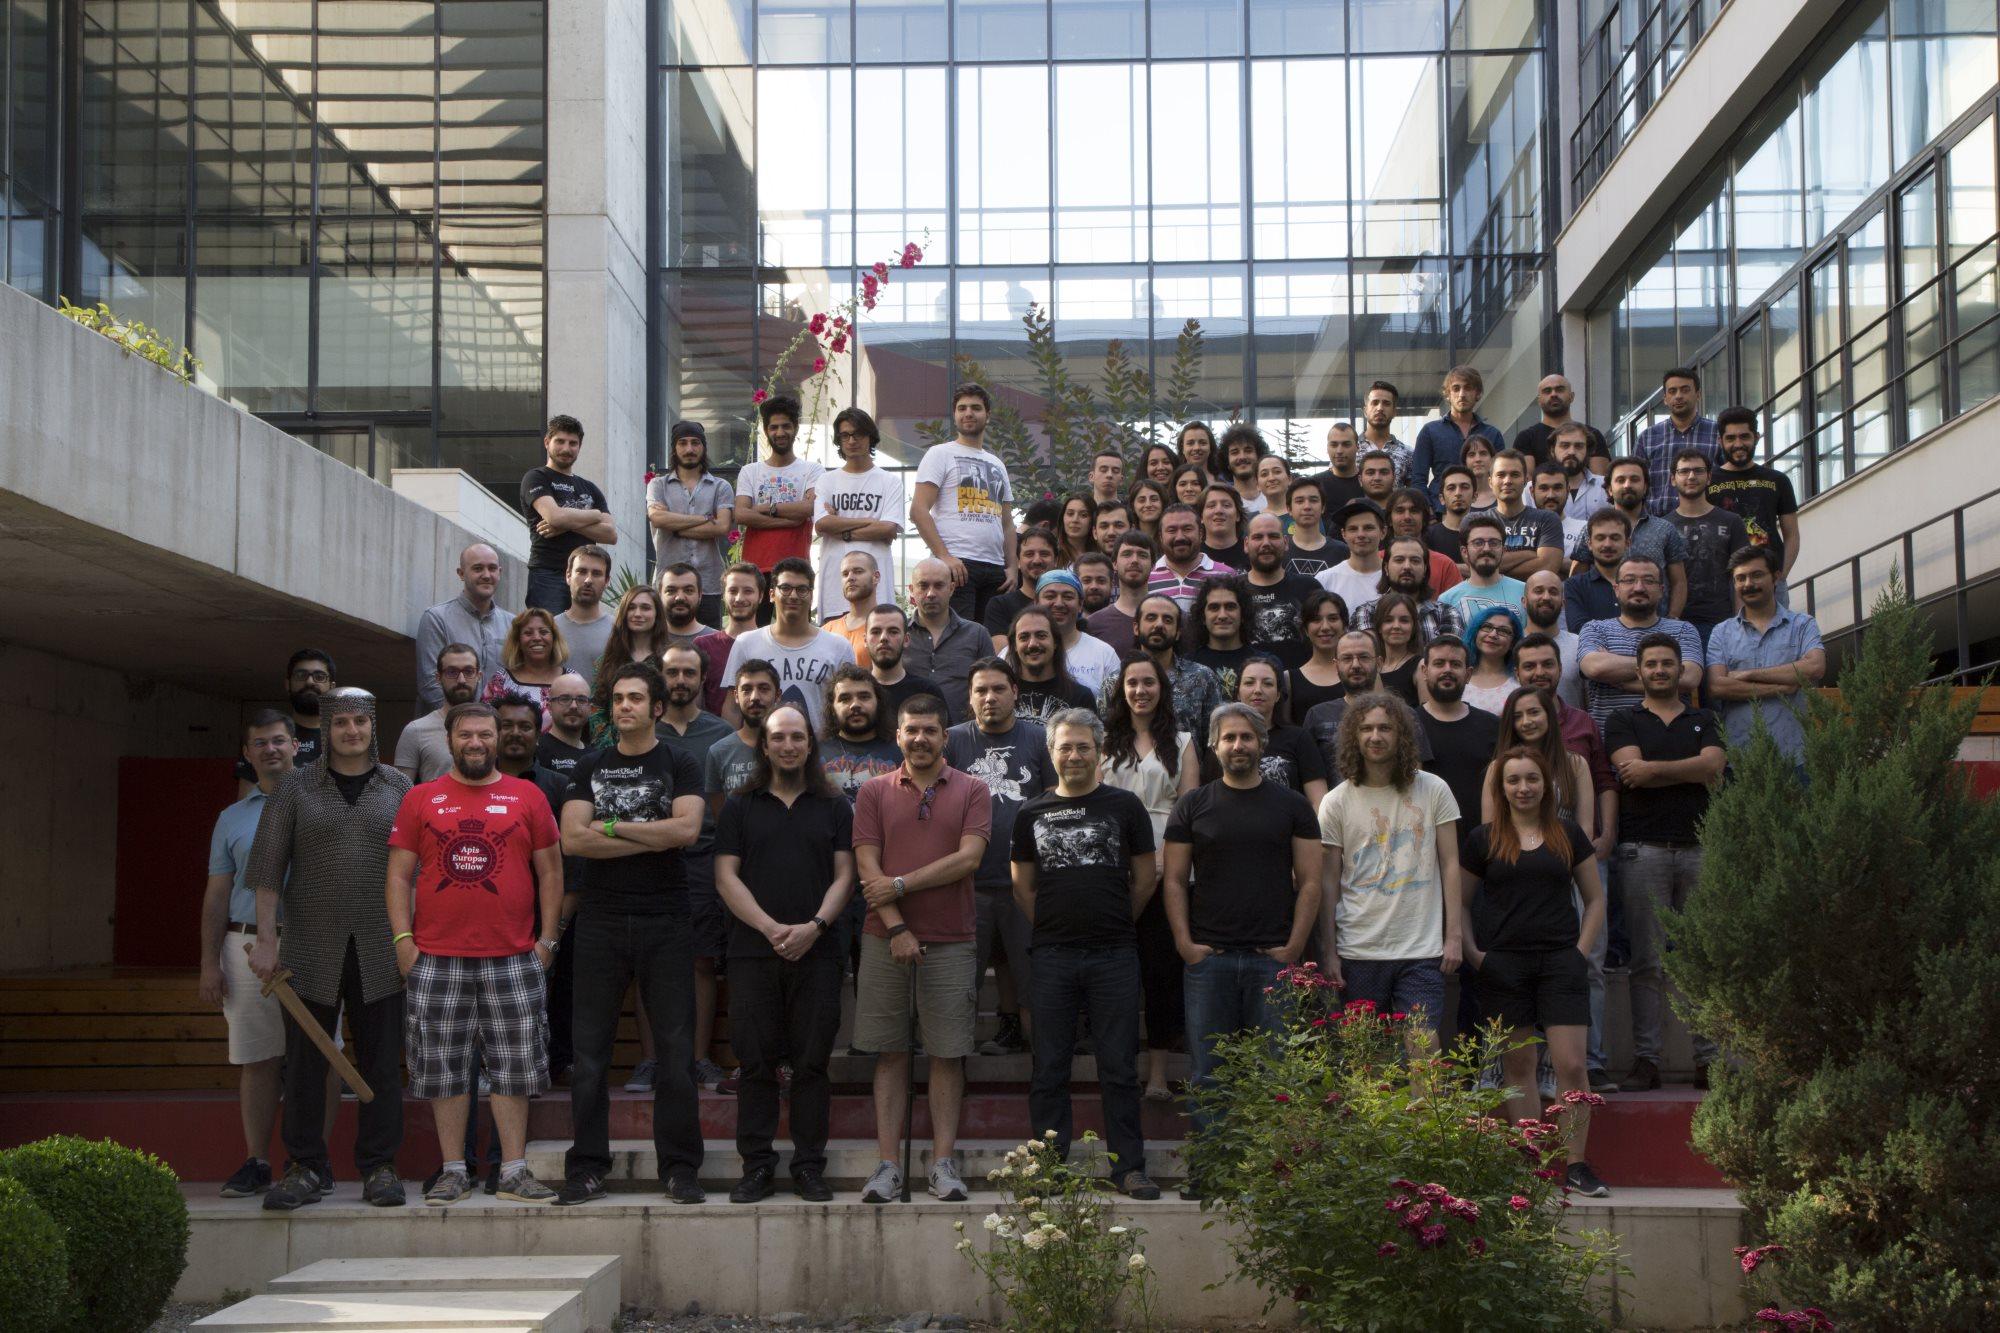 Mount and Blade II: Bannerlord -- Multiplayer Beta (Steam dev blog